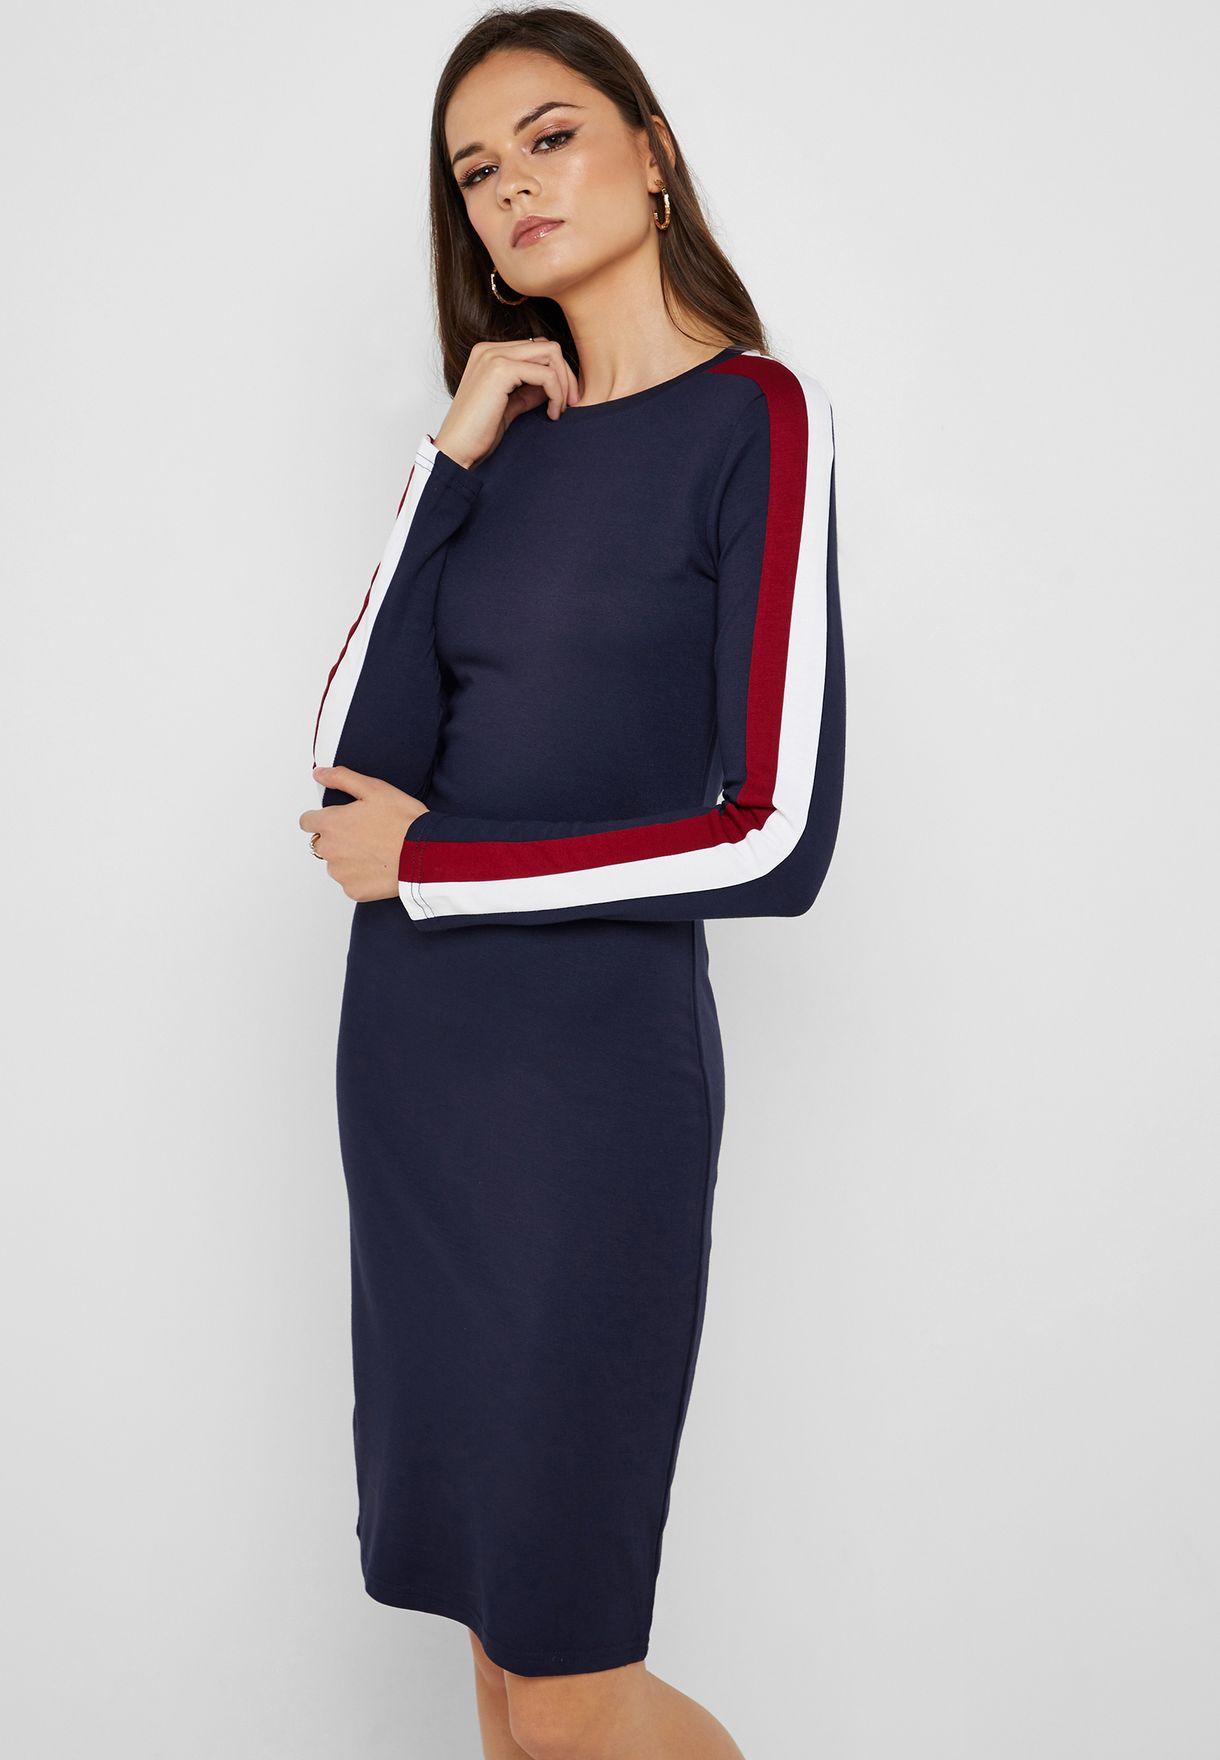 e91e79b33 تسوق فستان ميدي كاجوال ماركة جينجر لون كحلي LDRJ-225SADIE في ...